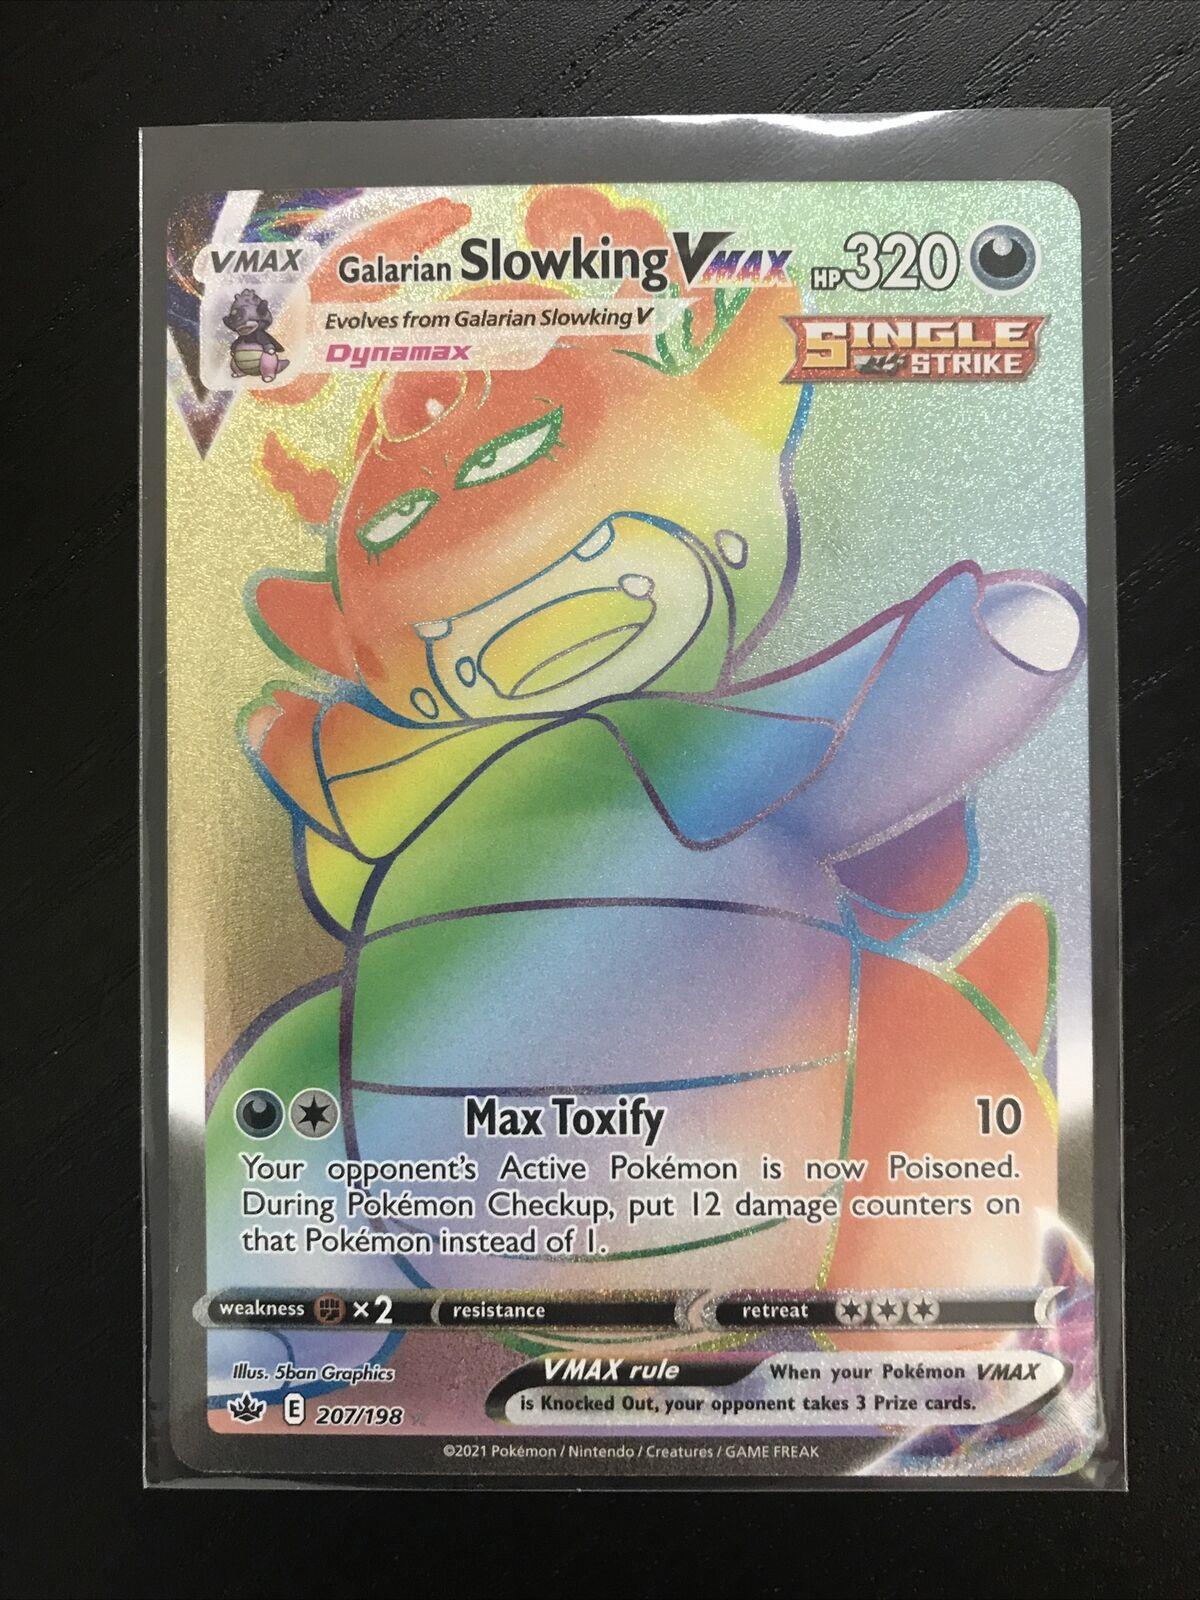 GALARIAN SLOWKING Vmax Rainbow Rare Chilling Reign 207/198 Pokemon TCG